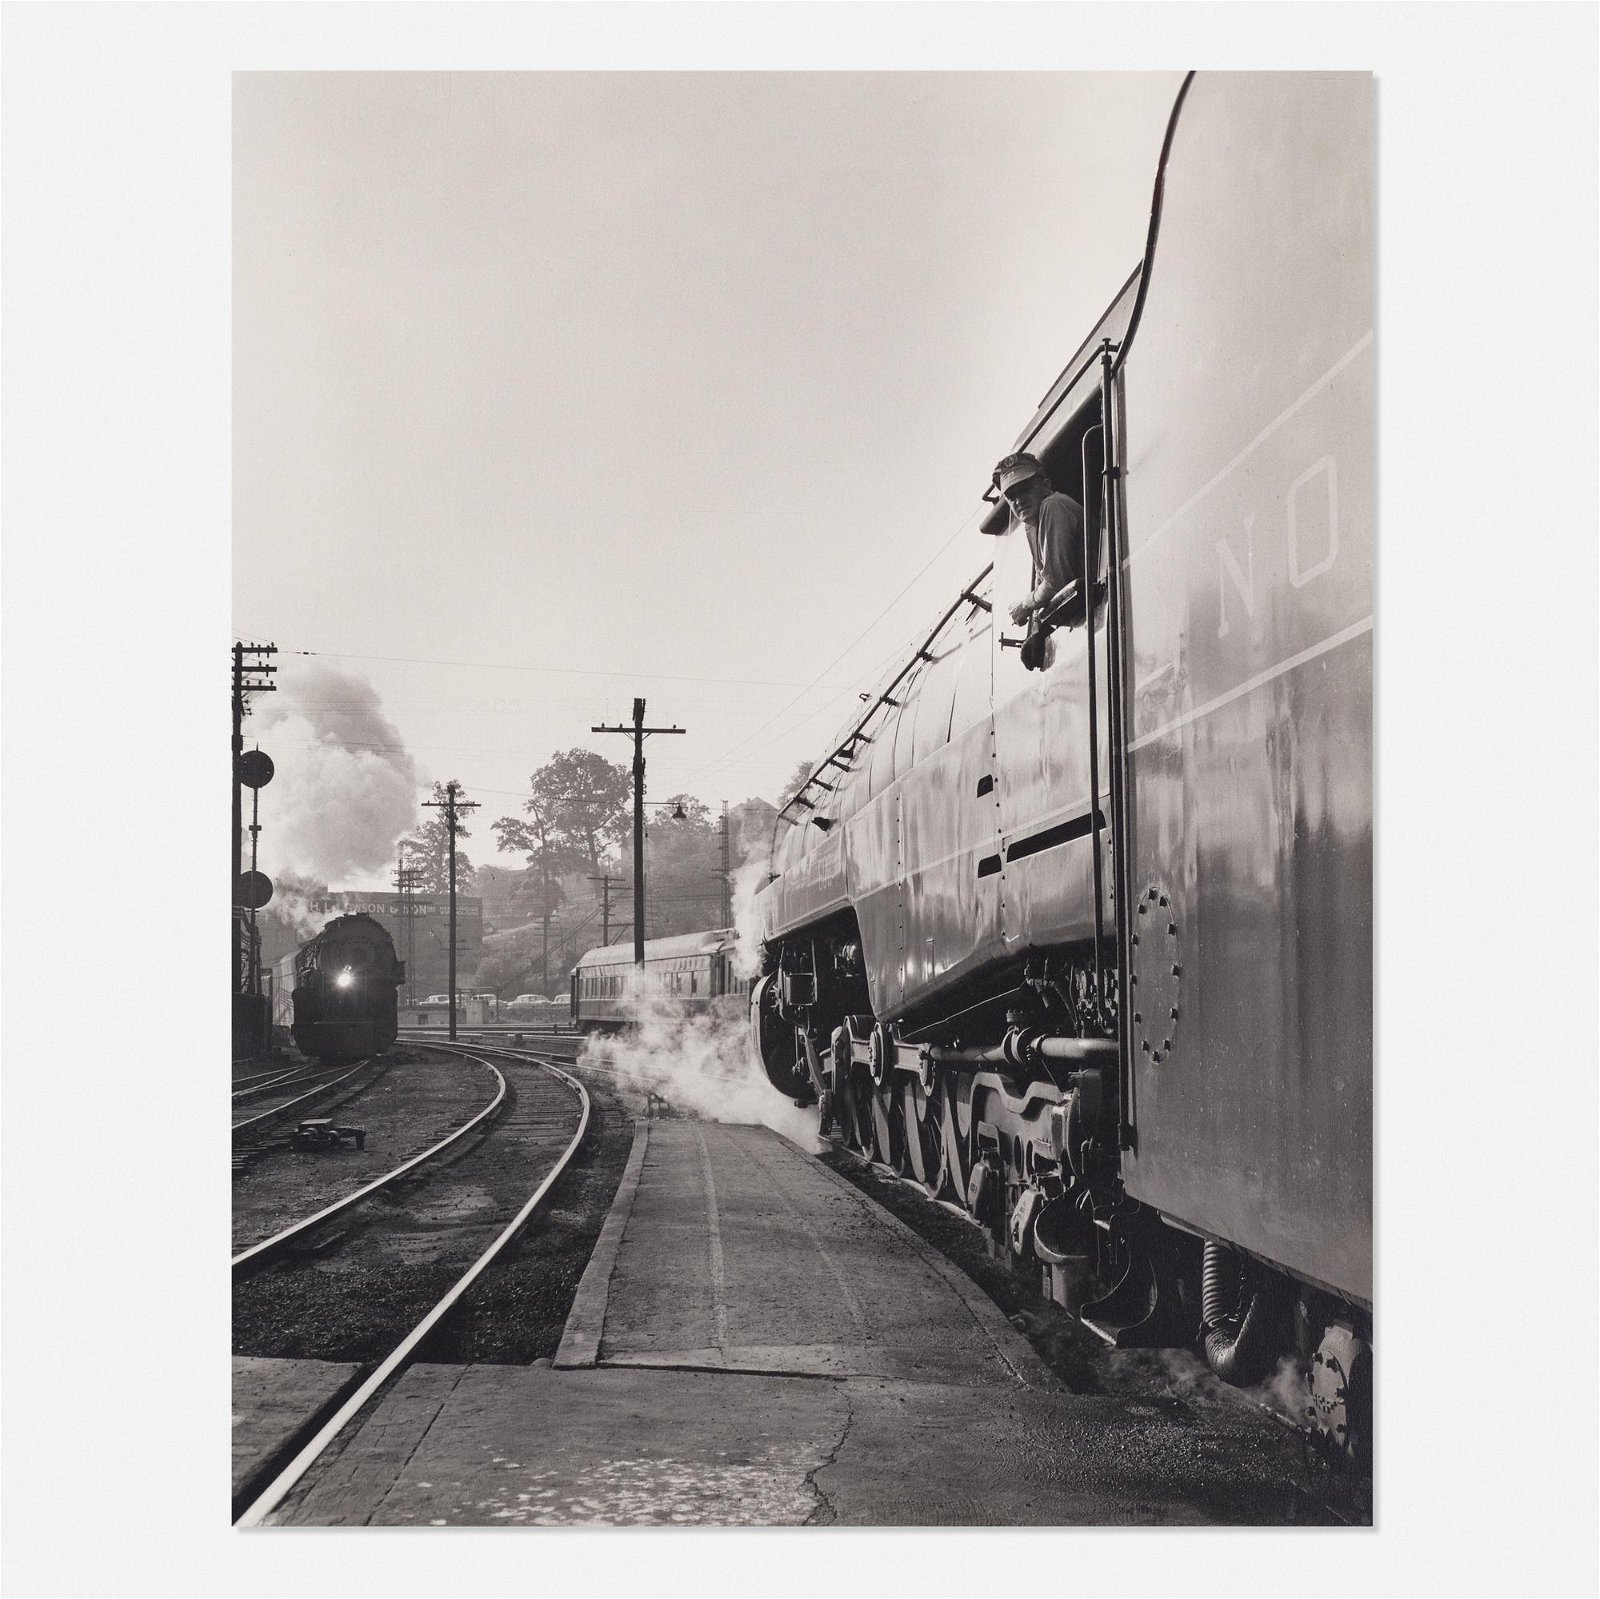 O. Winston Link, Fireman on Train No. 18…